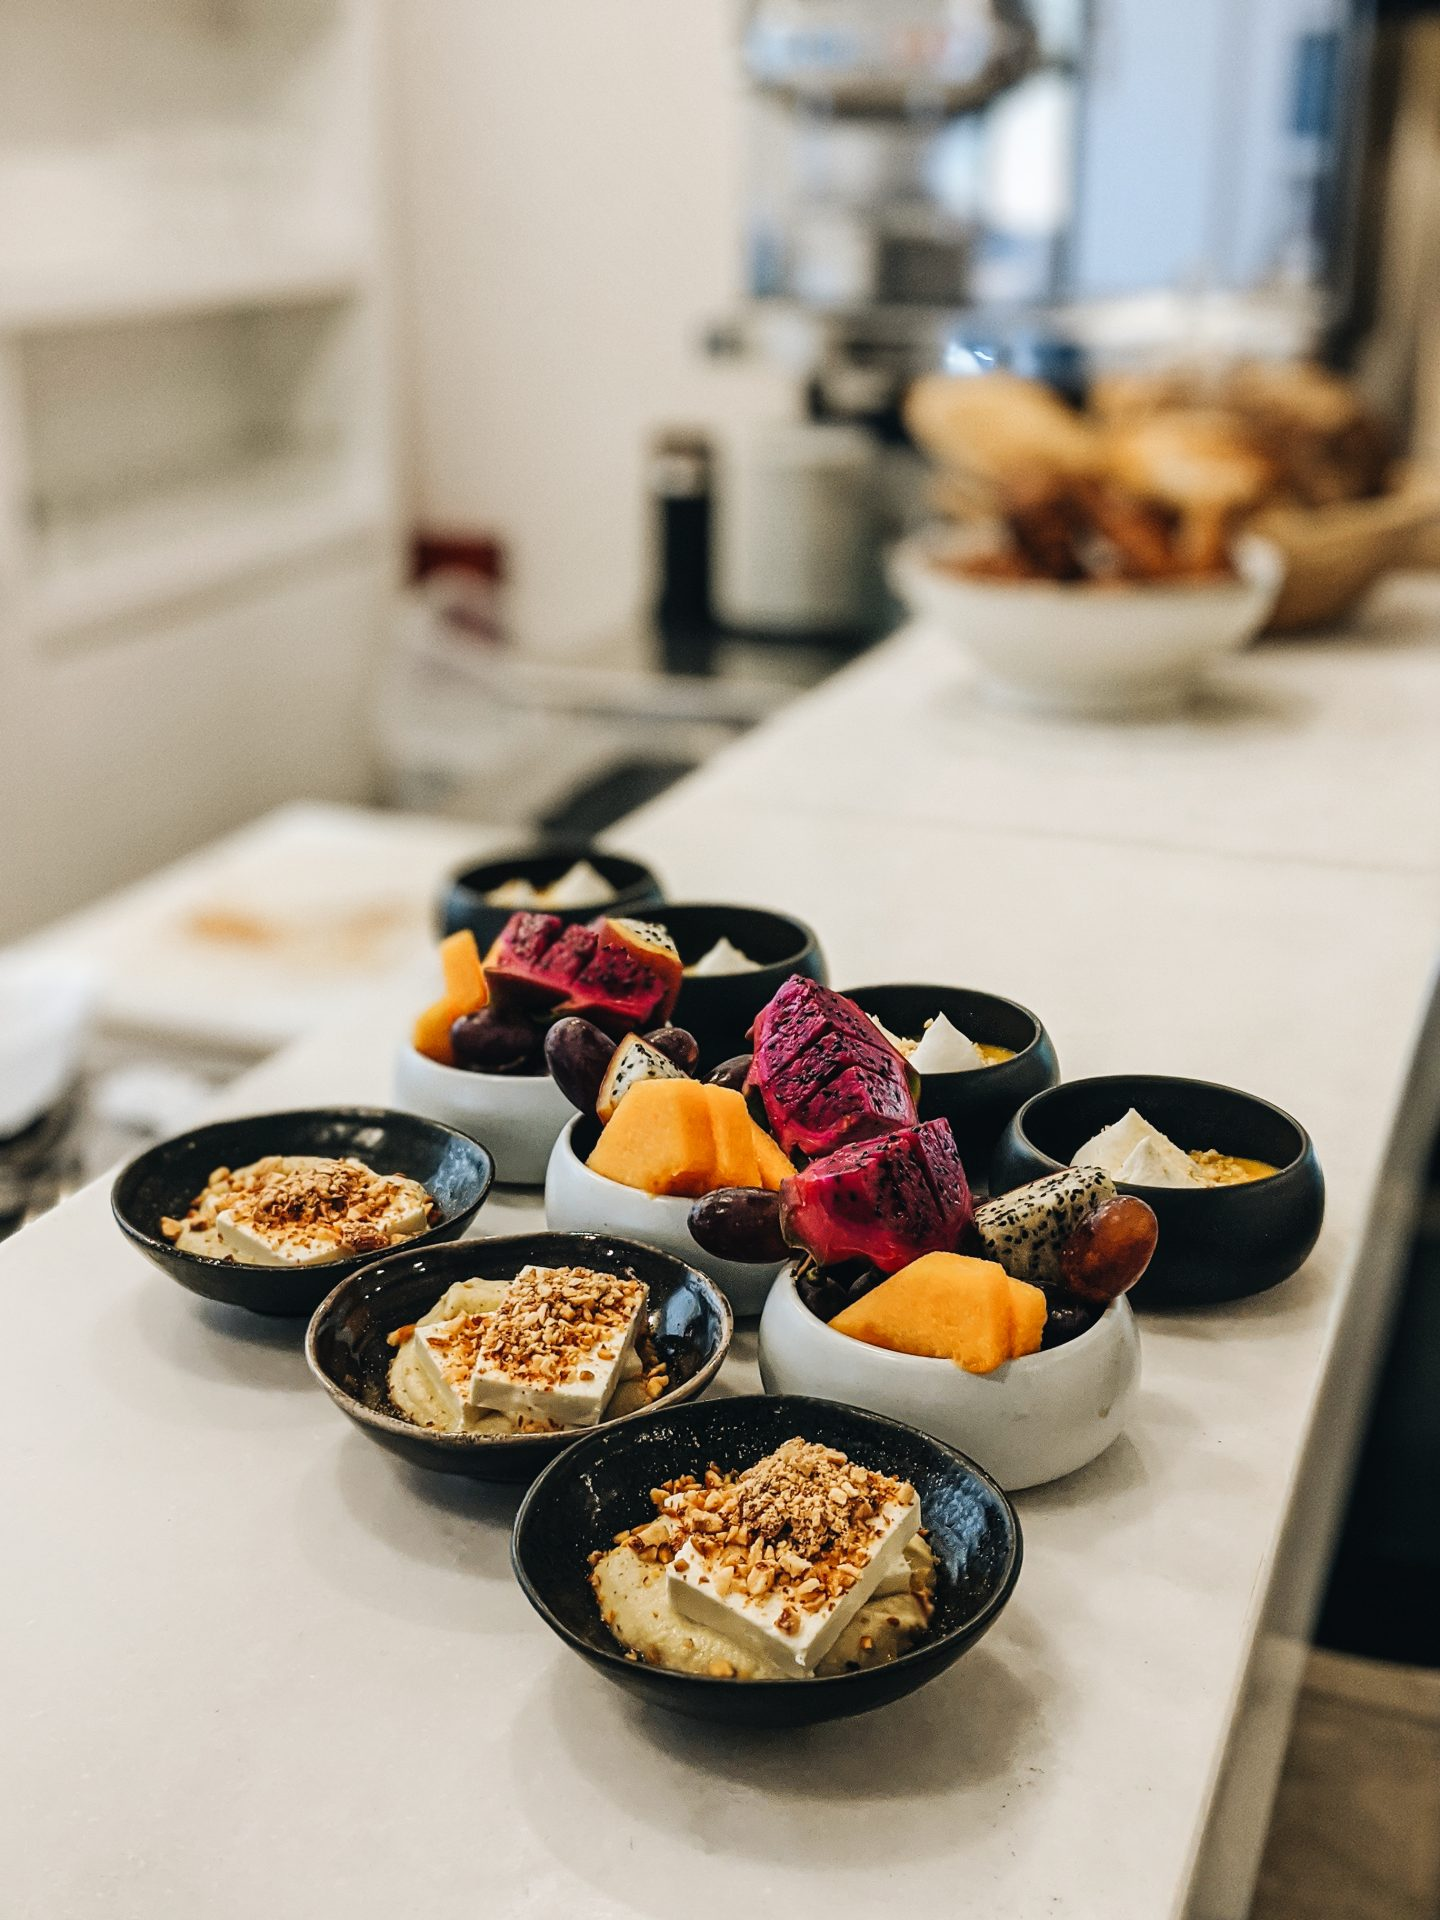 White villa hotel breakfast